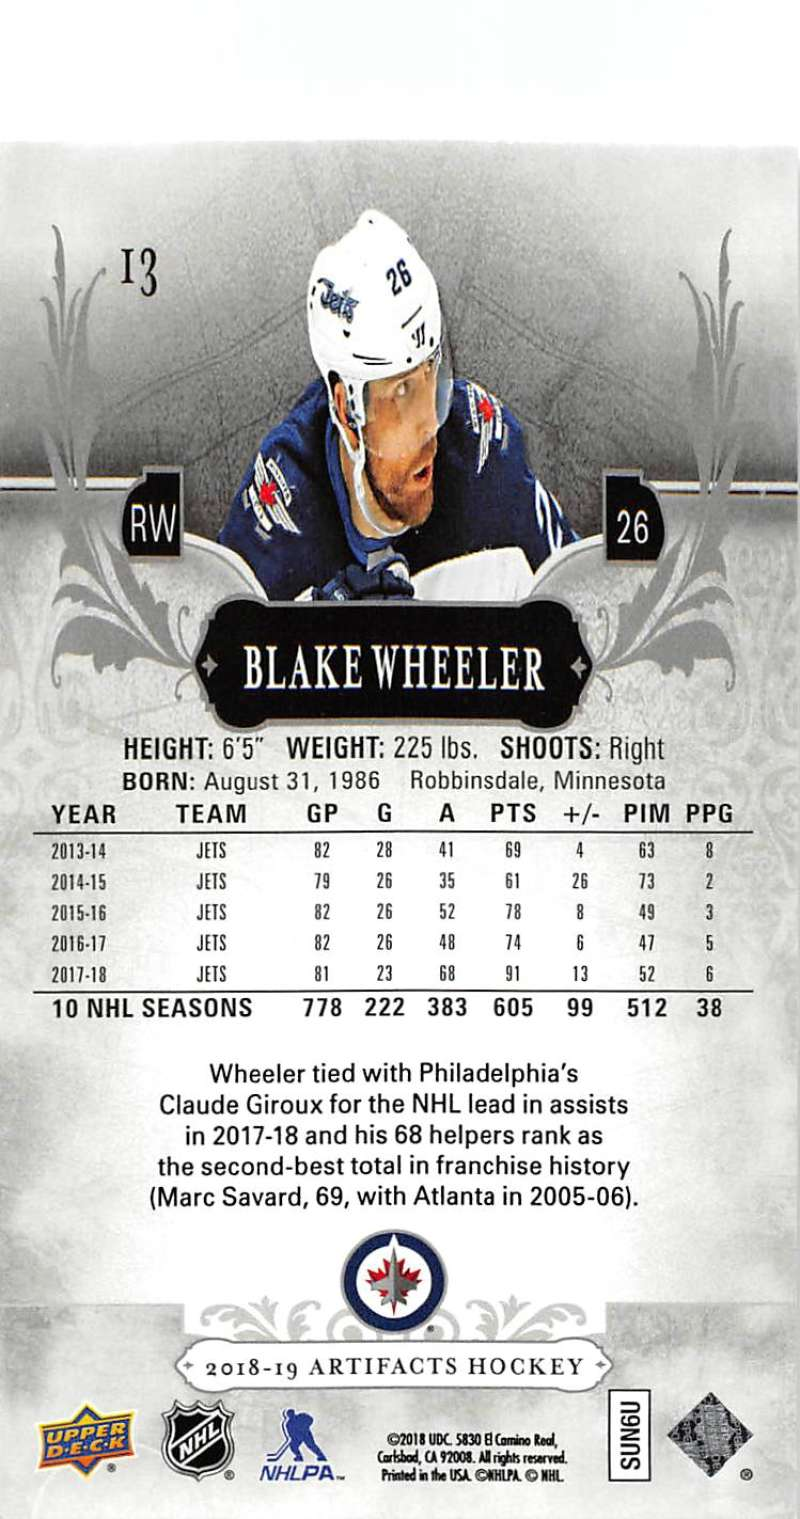 2018-19-Upper-Deck-Artifacts-Hockey-Cards-Pick-From-List-Rookies-Legends-SPs miniature 23